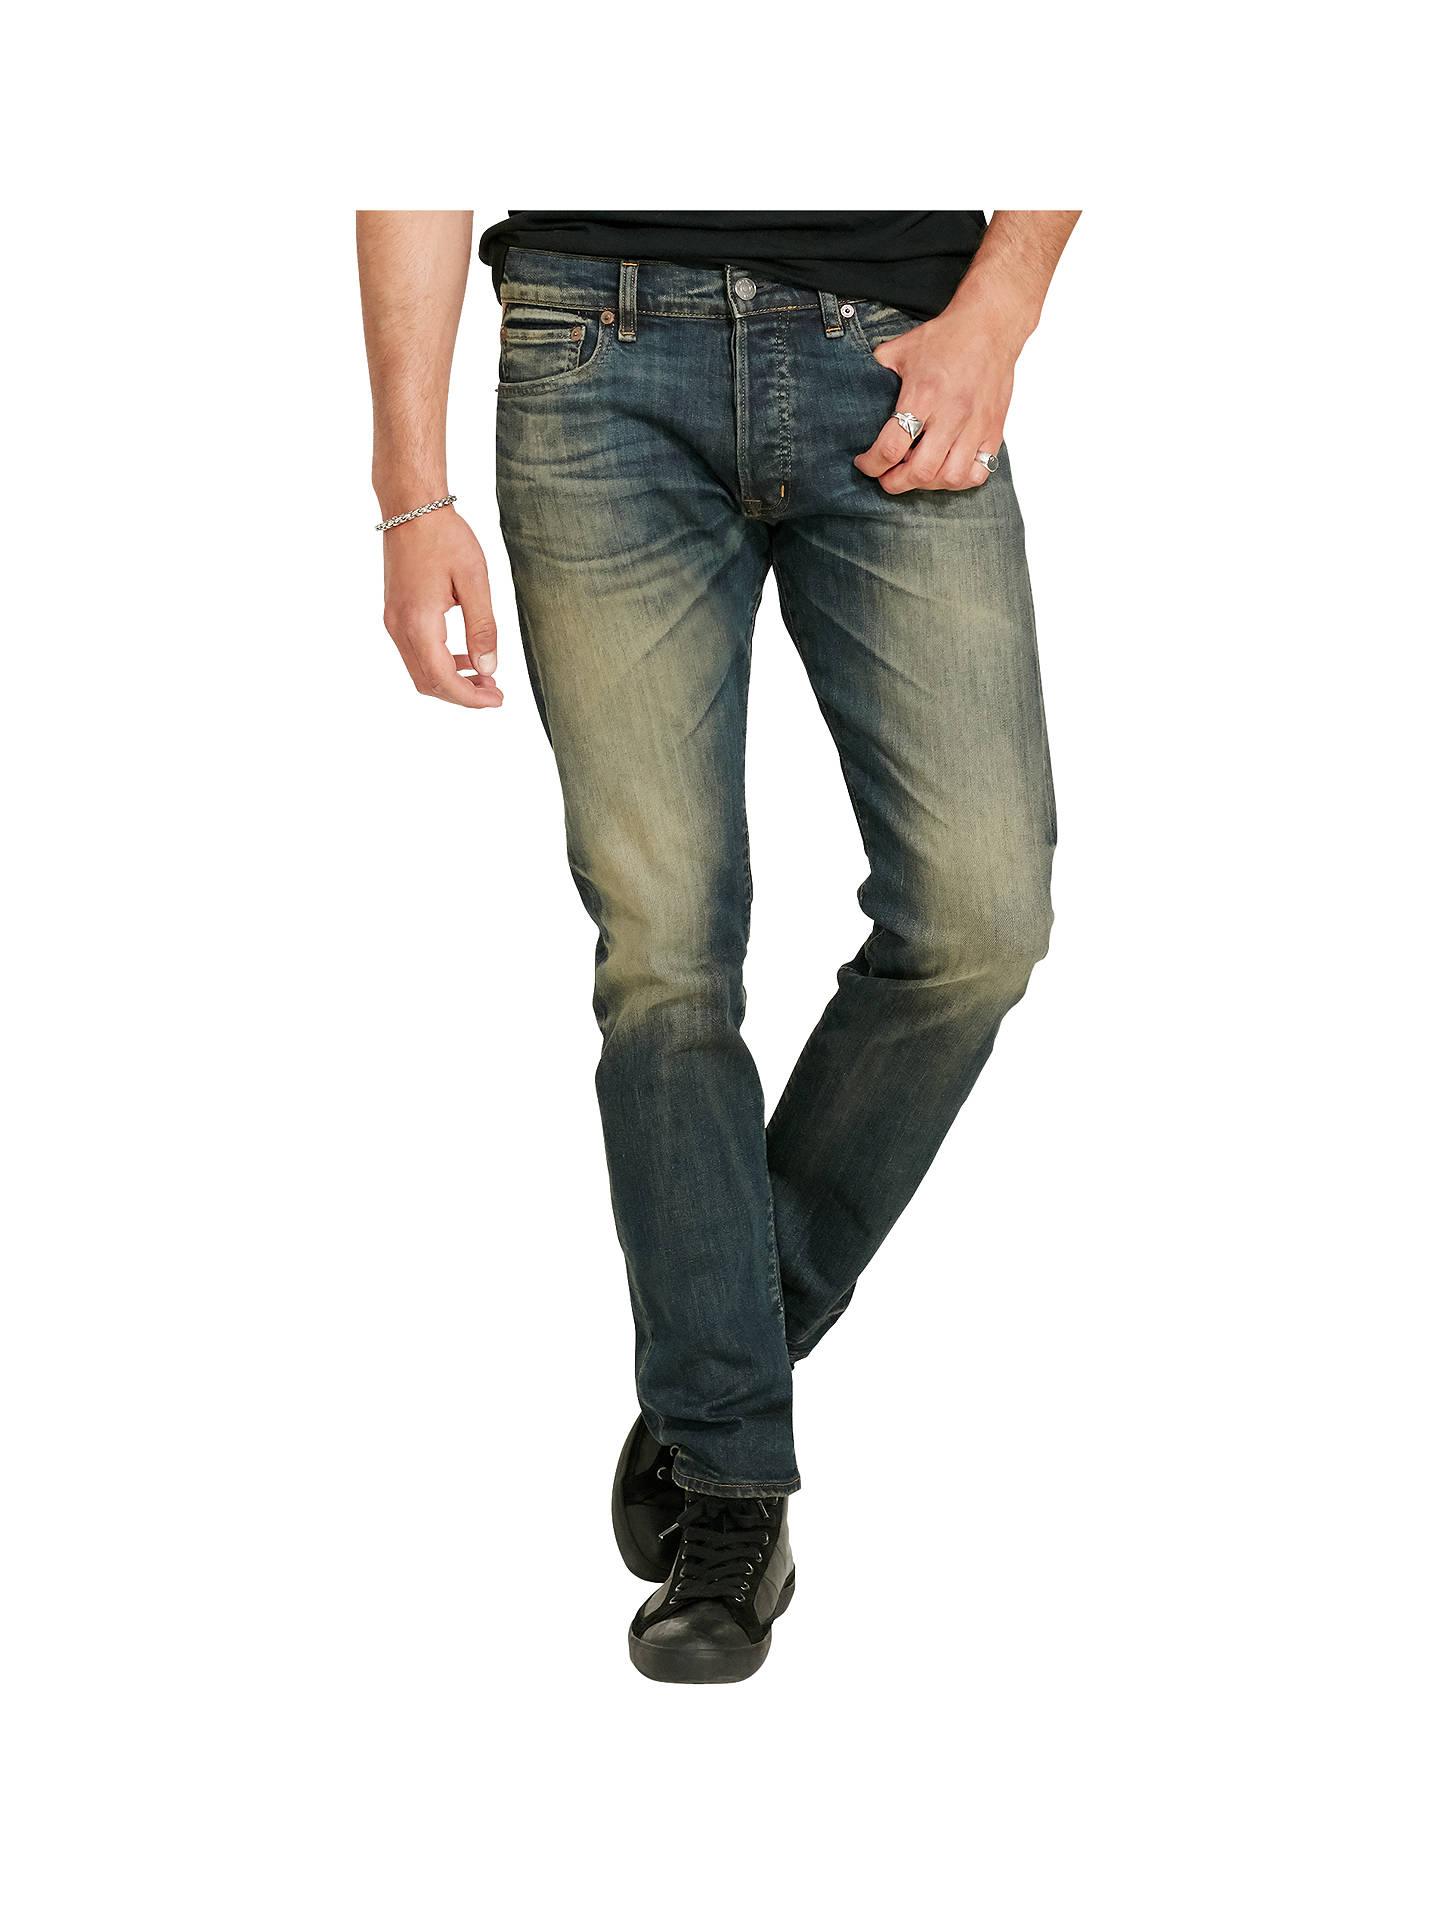 19335a3d5 Buy Denim   Supply Ralph Lauren Slim 5 Pocket Jeans